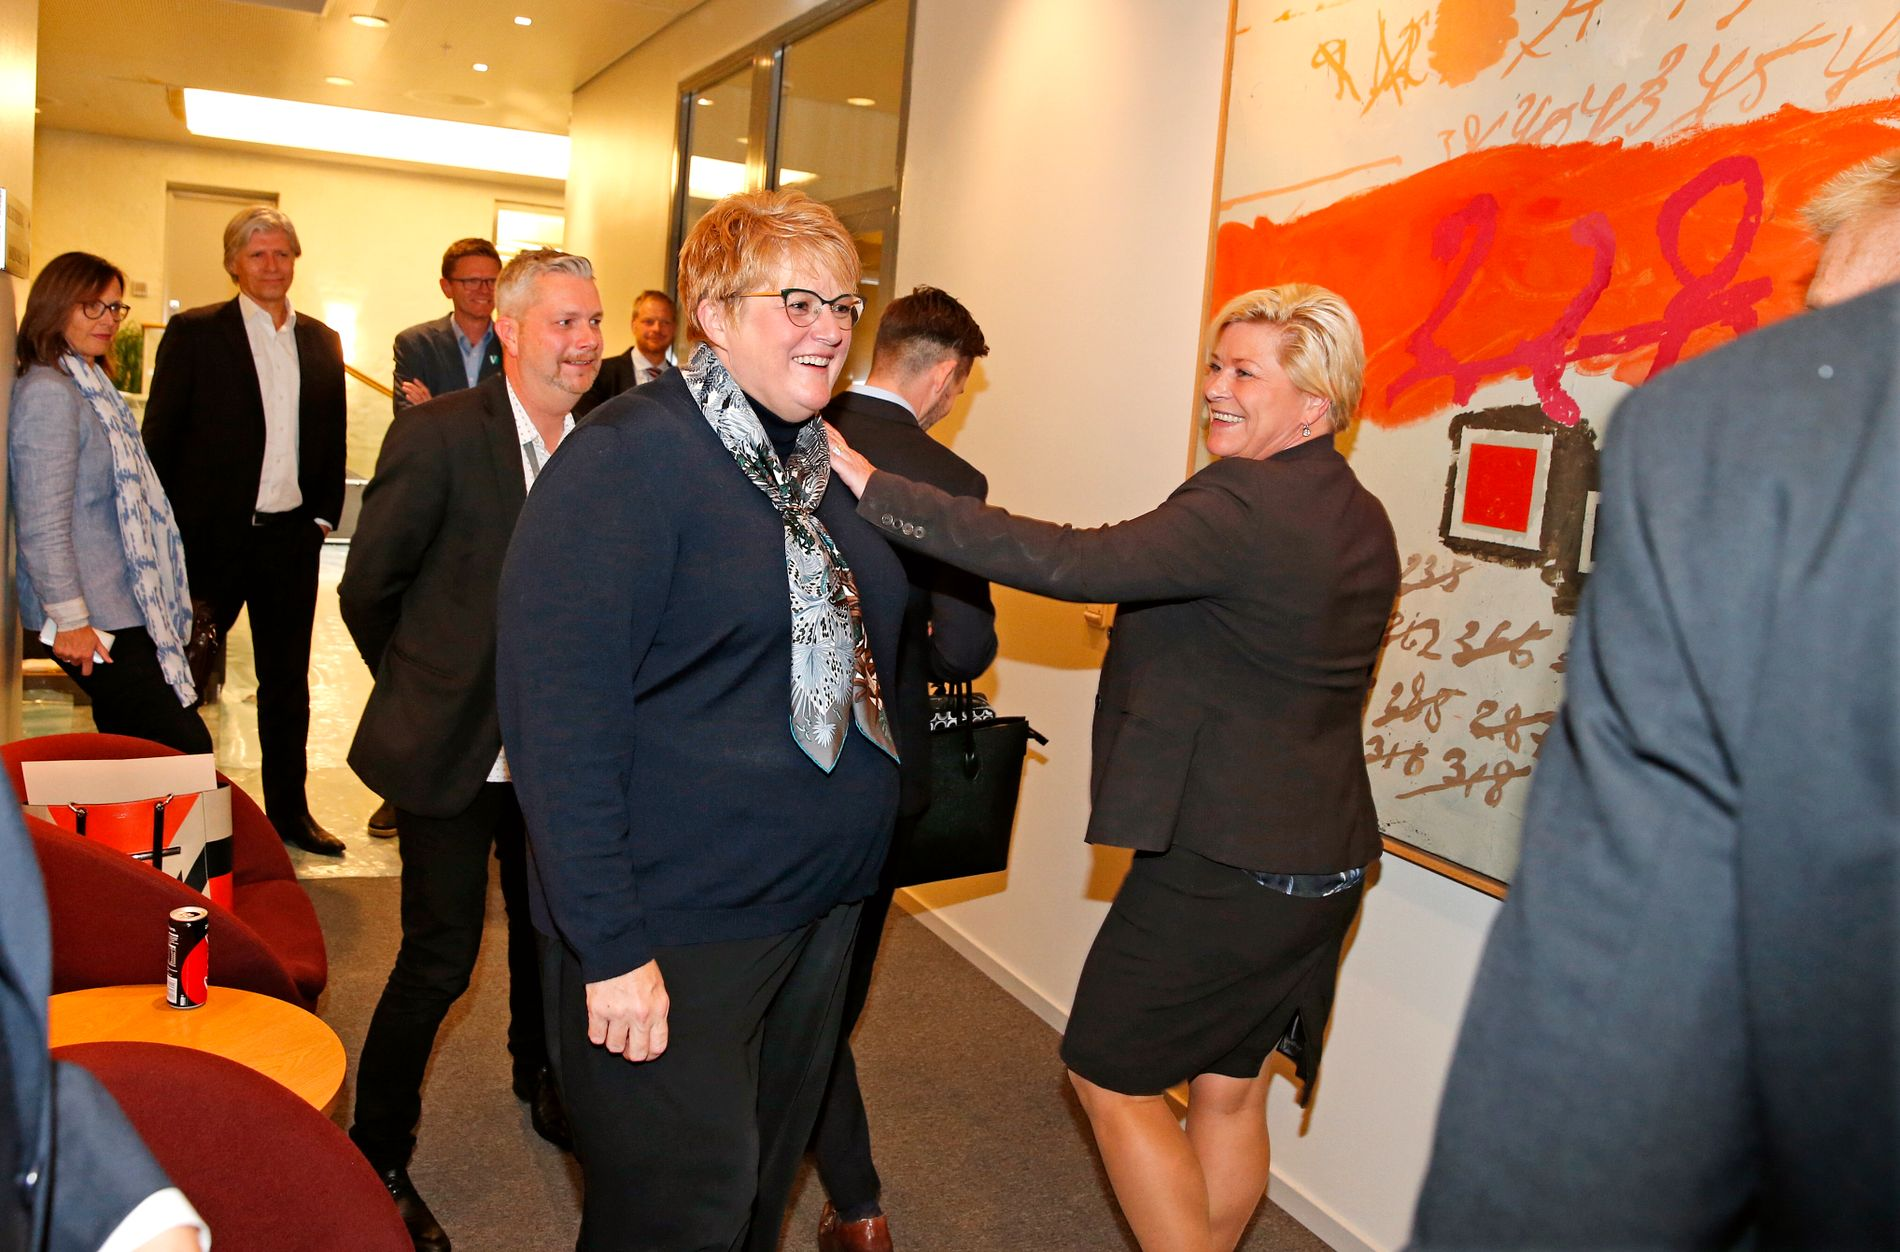 Regjeringspartiene møtes til forhandlinger. FOTO: TROND SOLBERG/VG